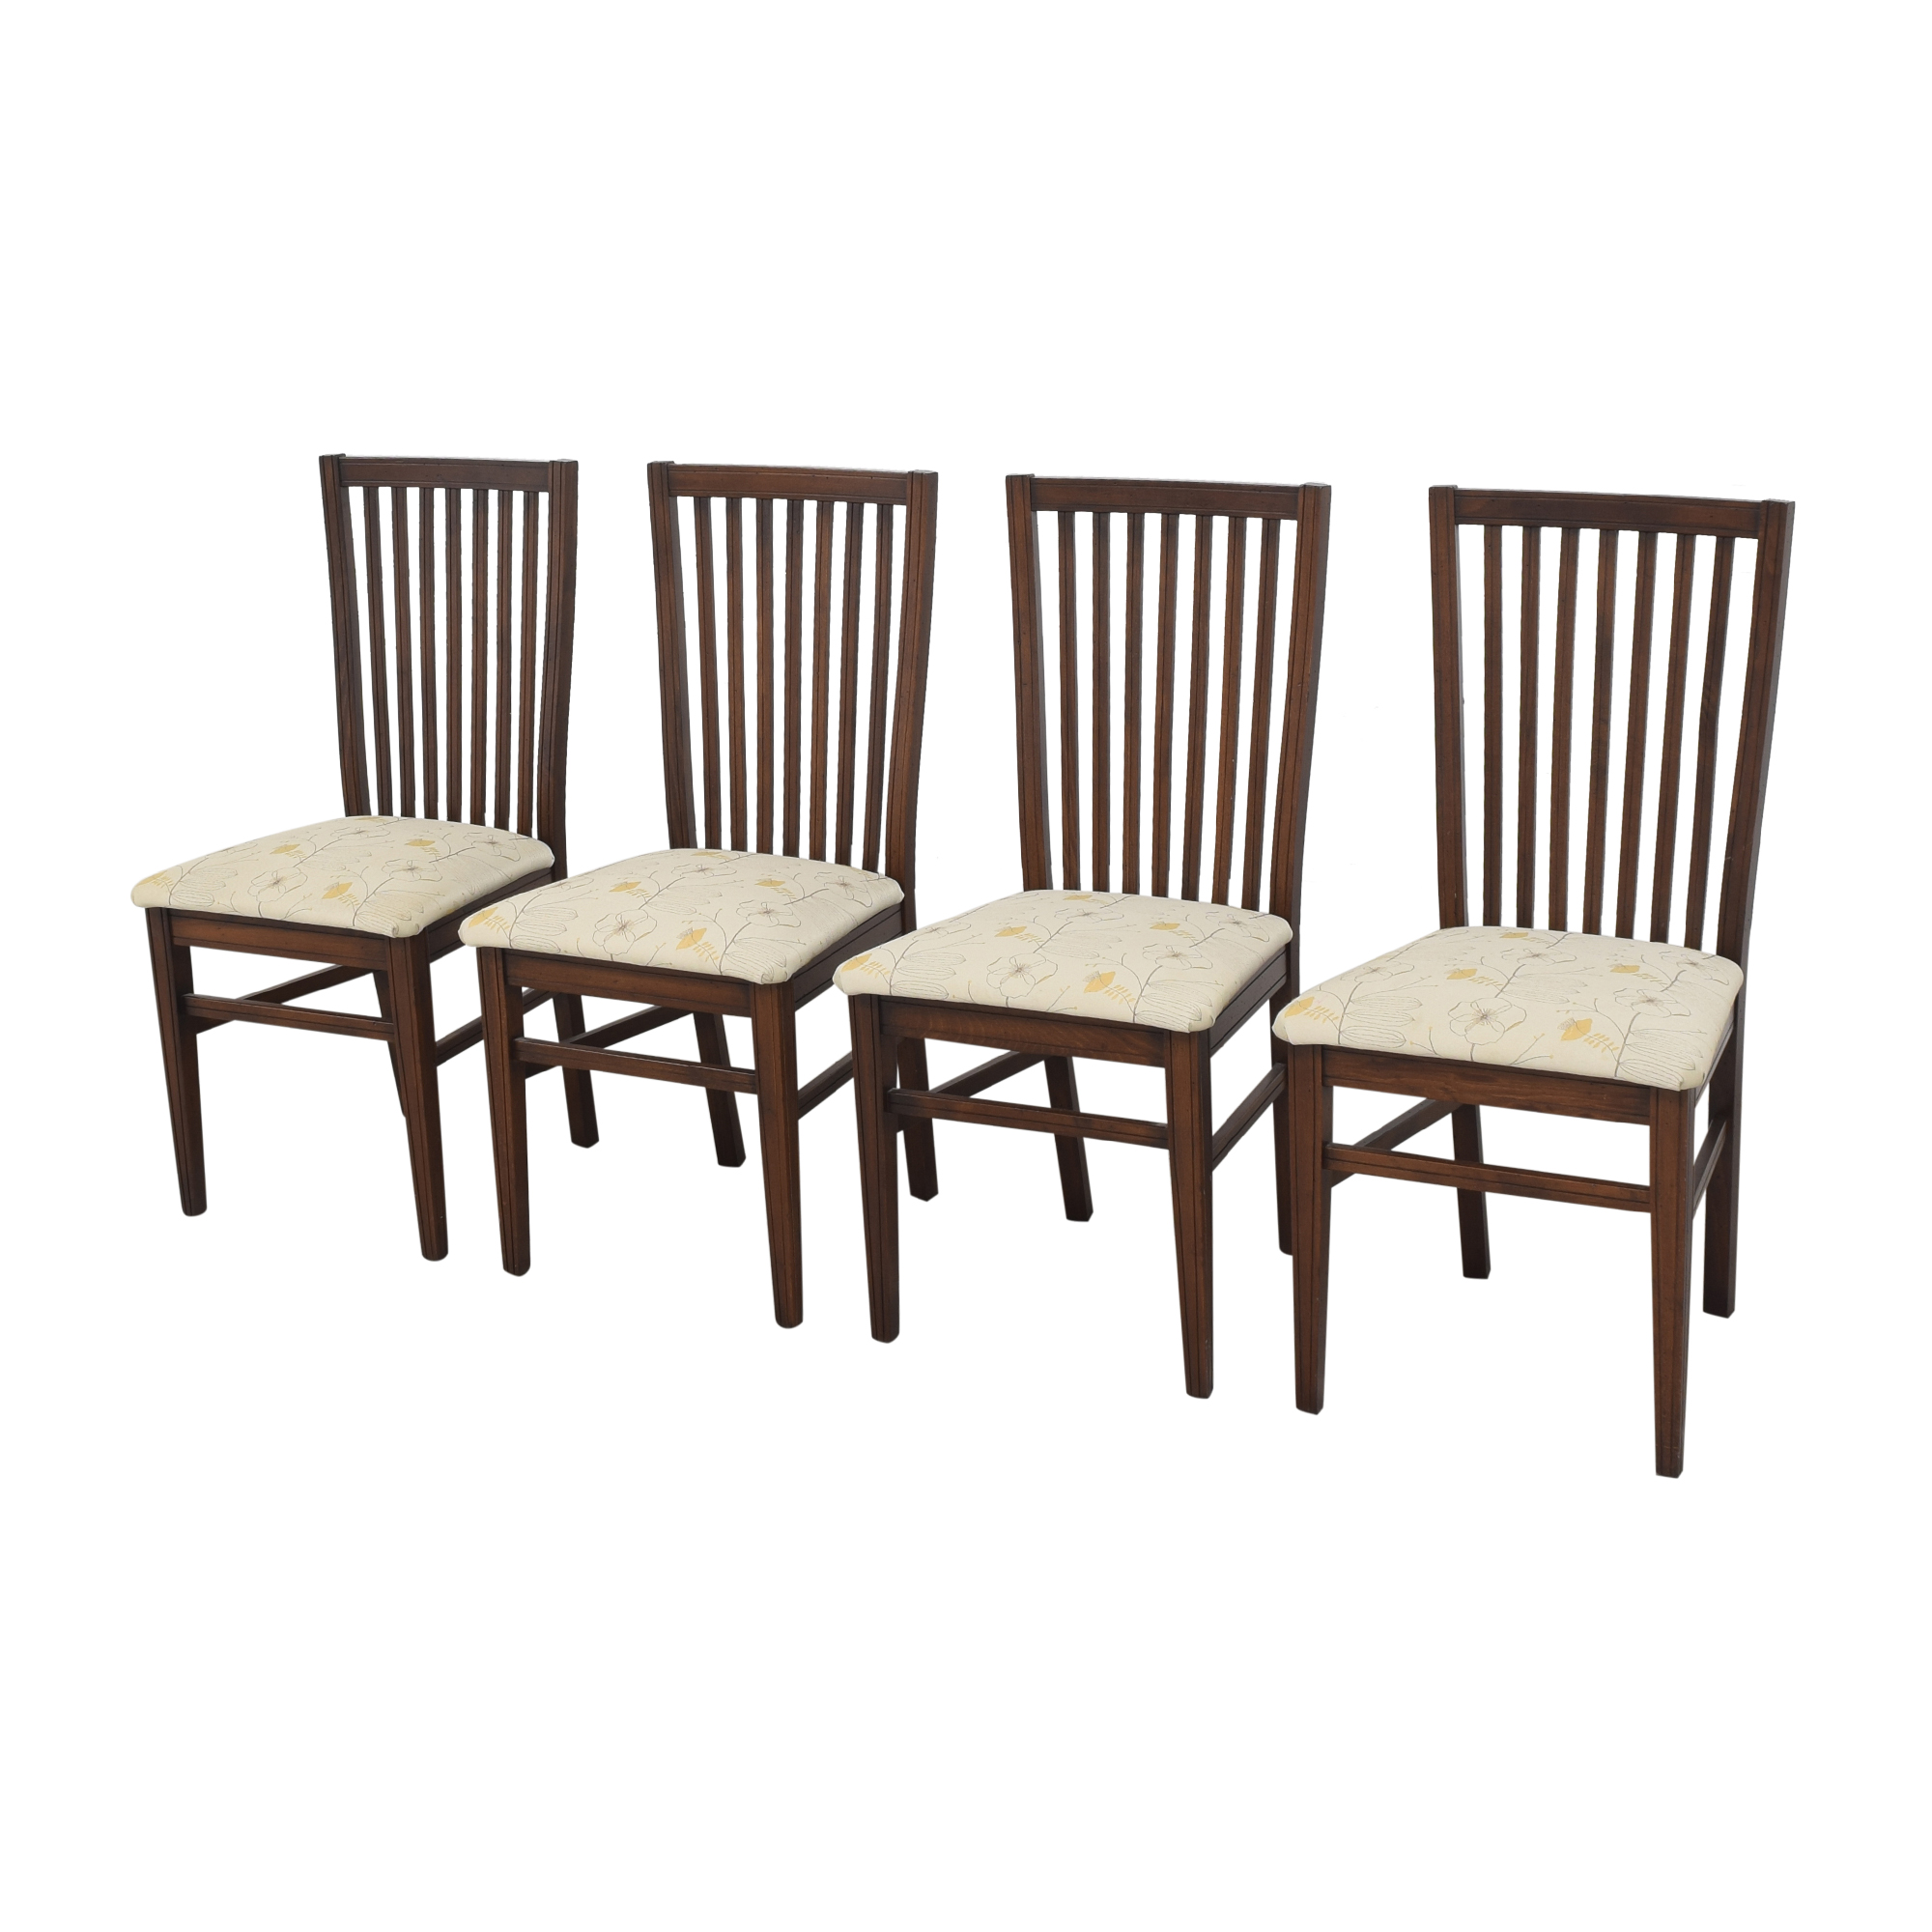 shop Arhaus Anna Dining Side Chairs Arhaus Chairs